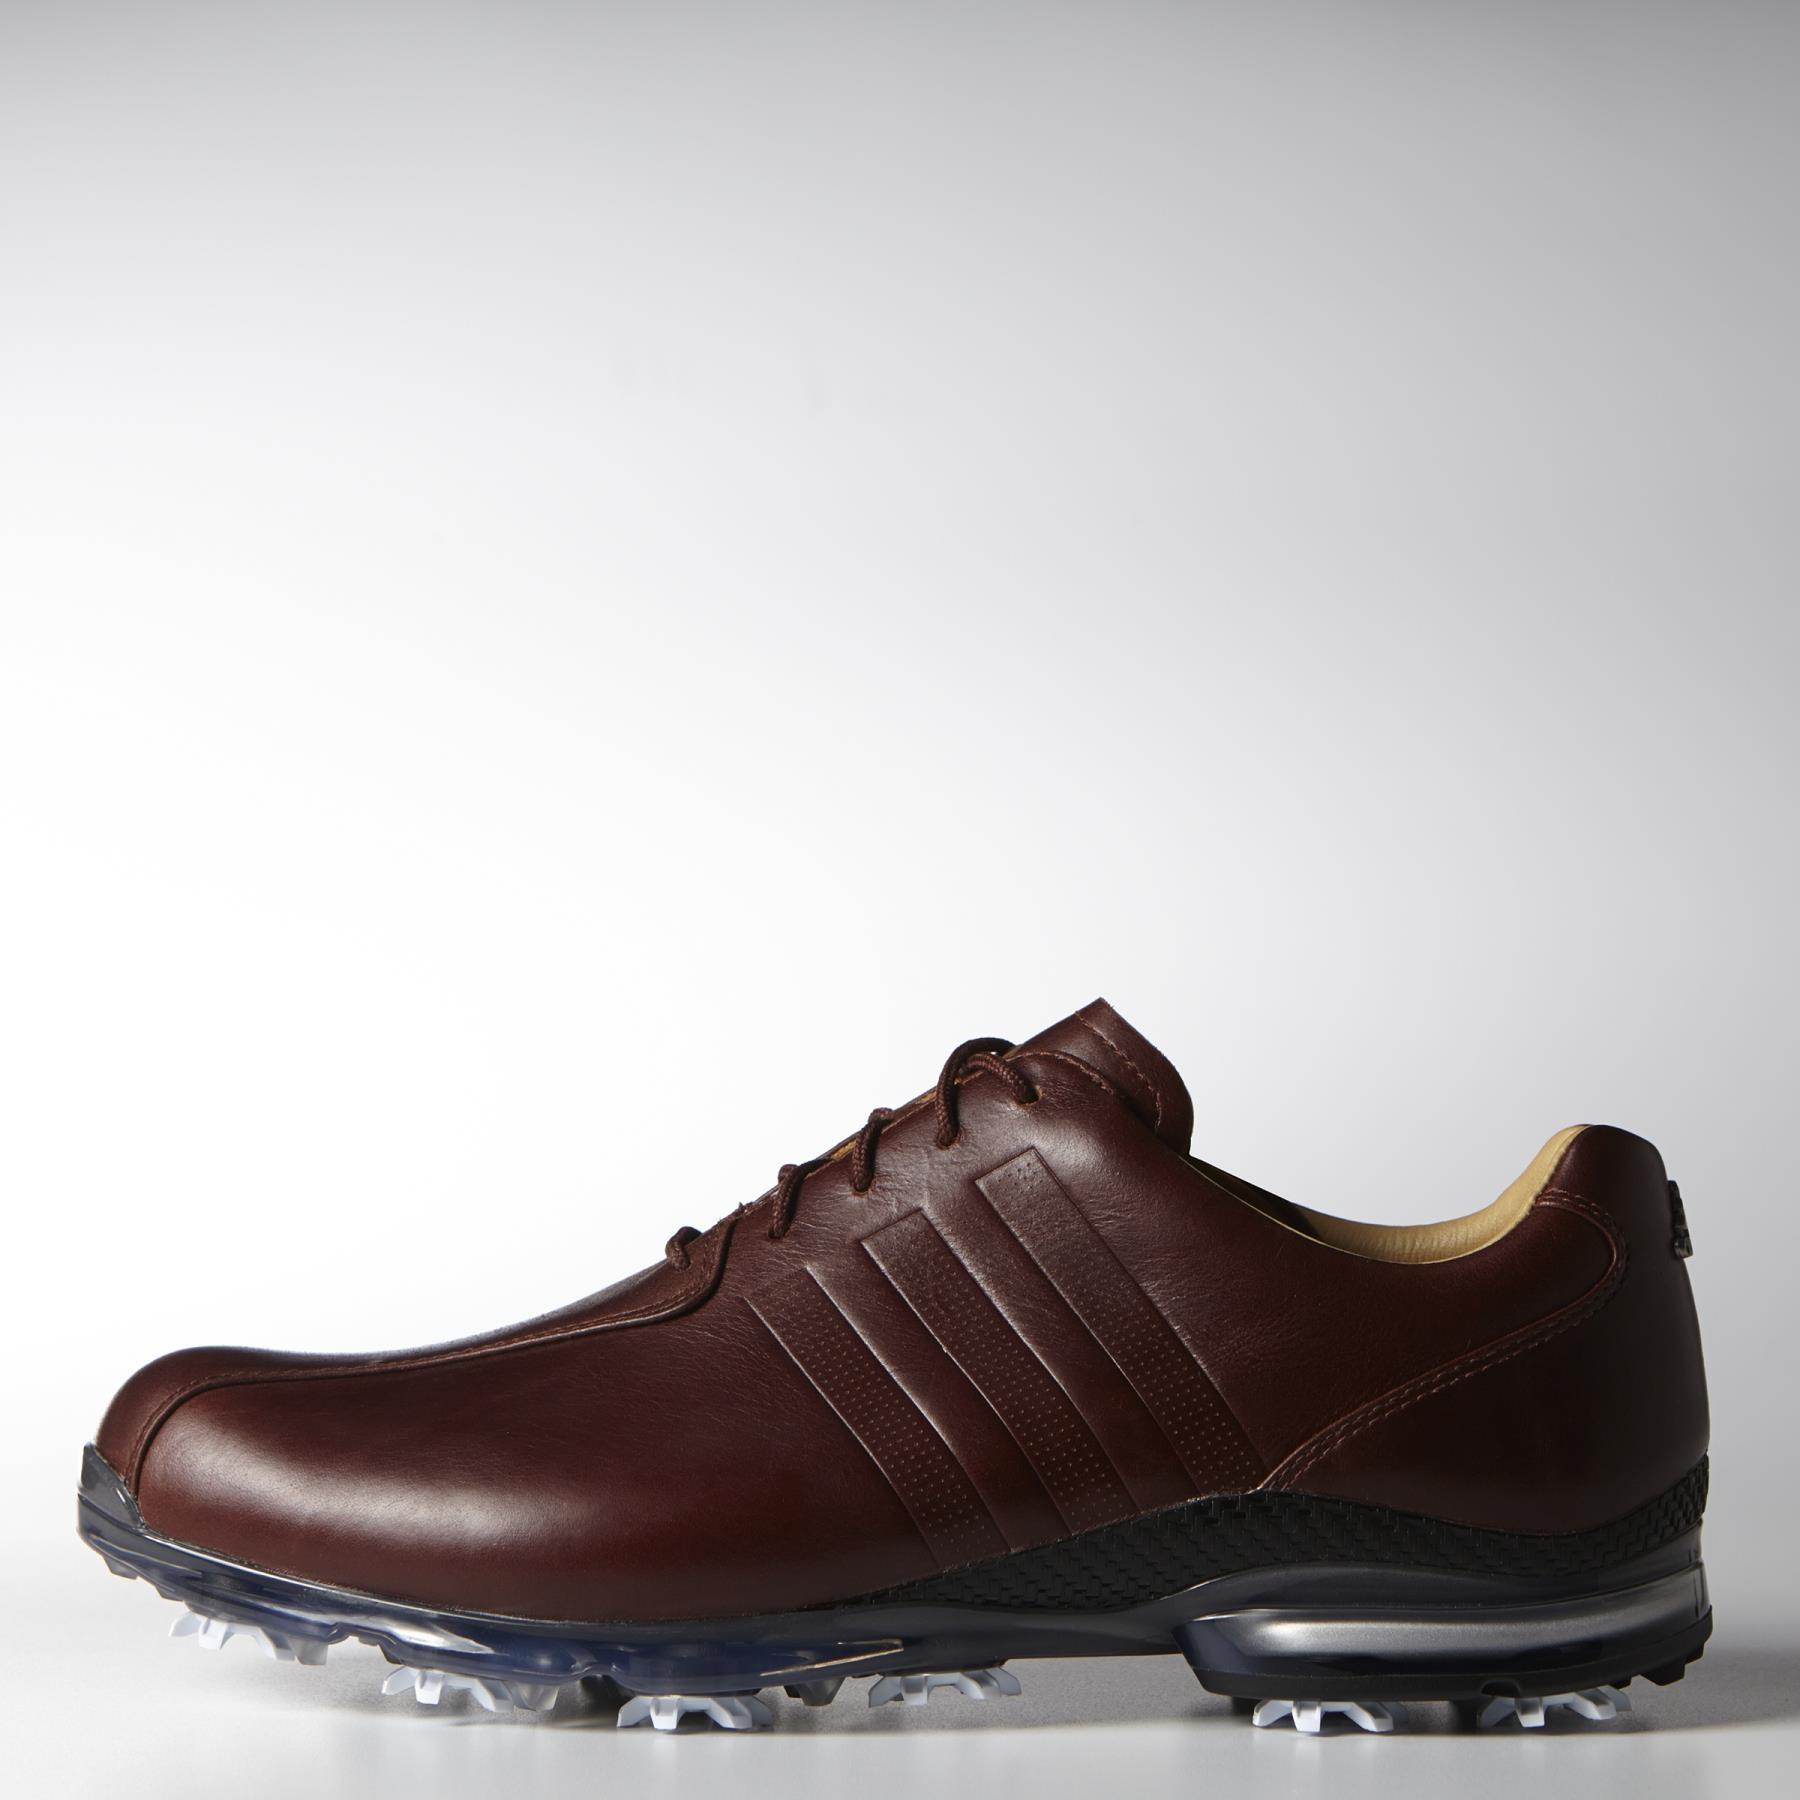 Adipure Golf Shoes Size